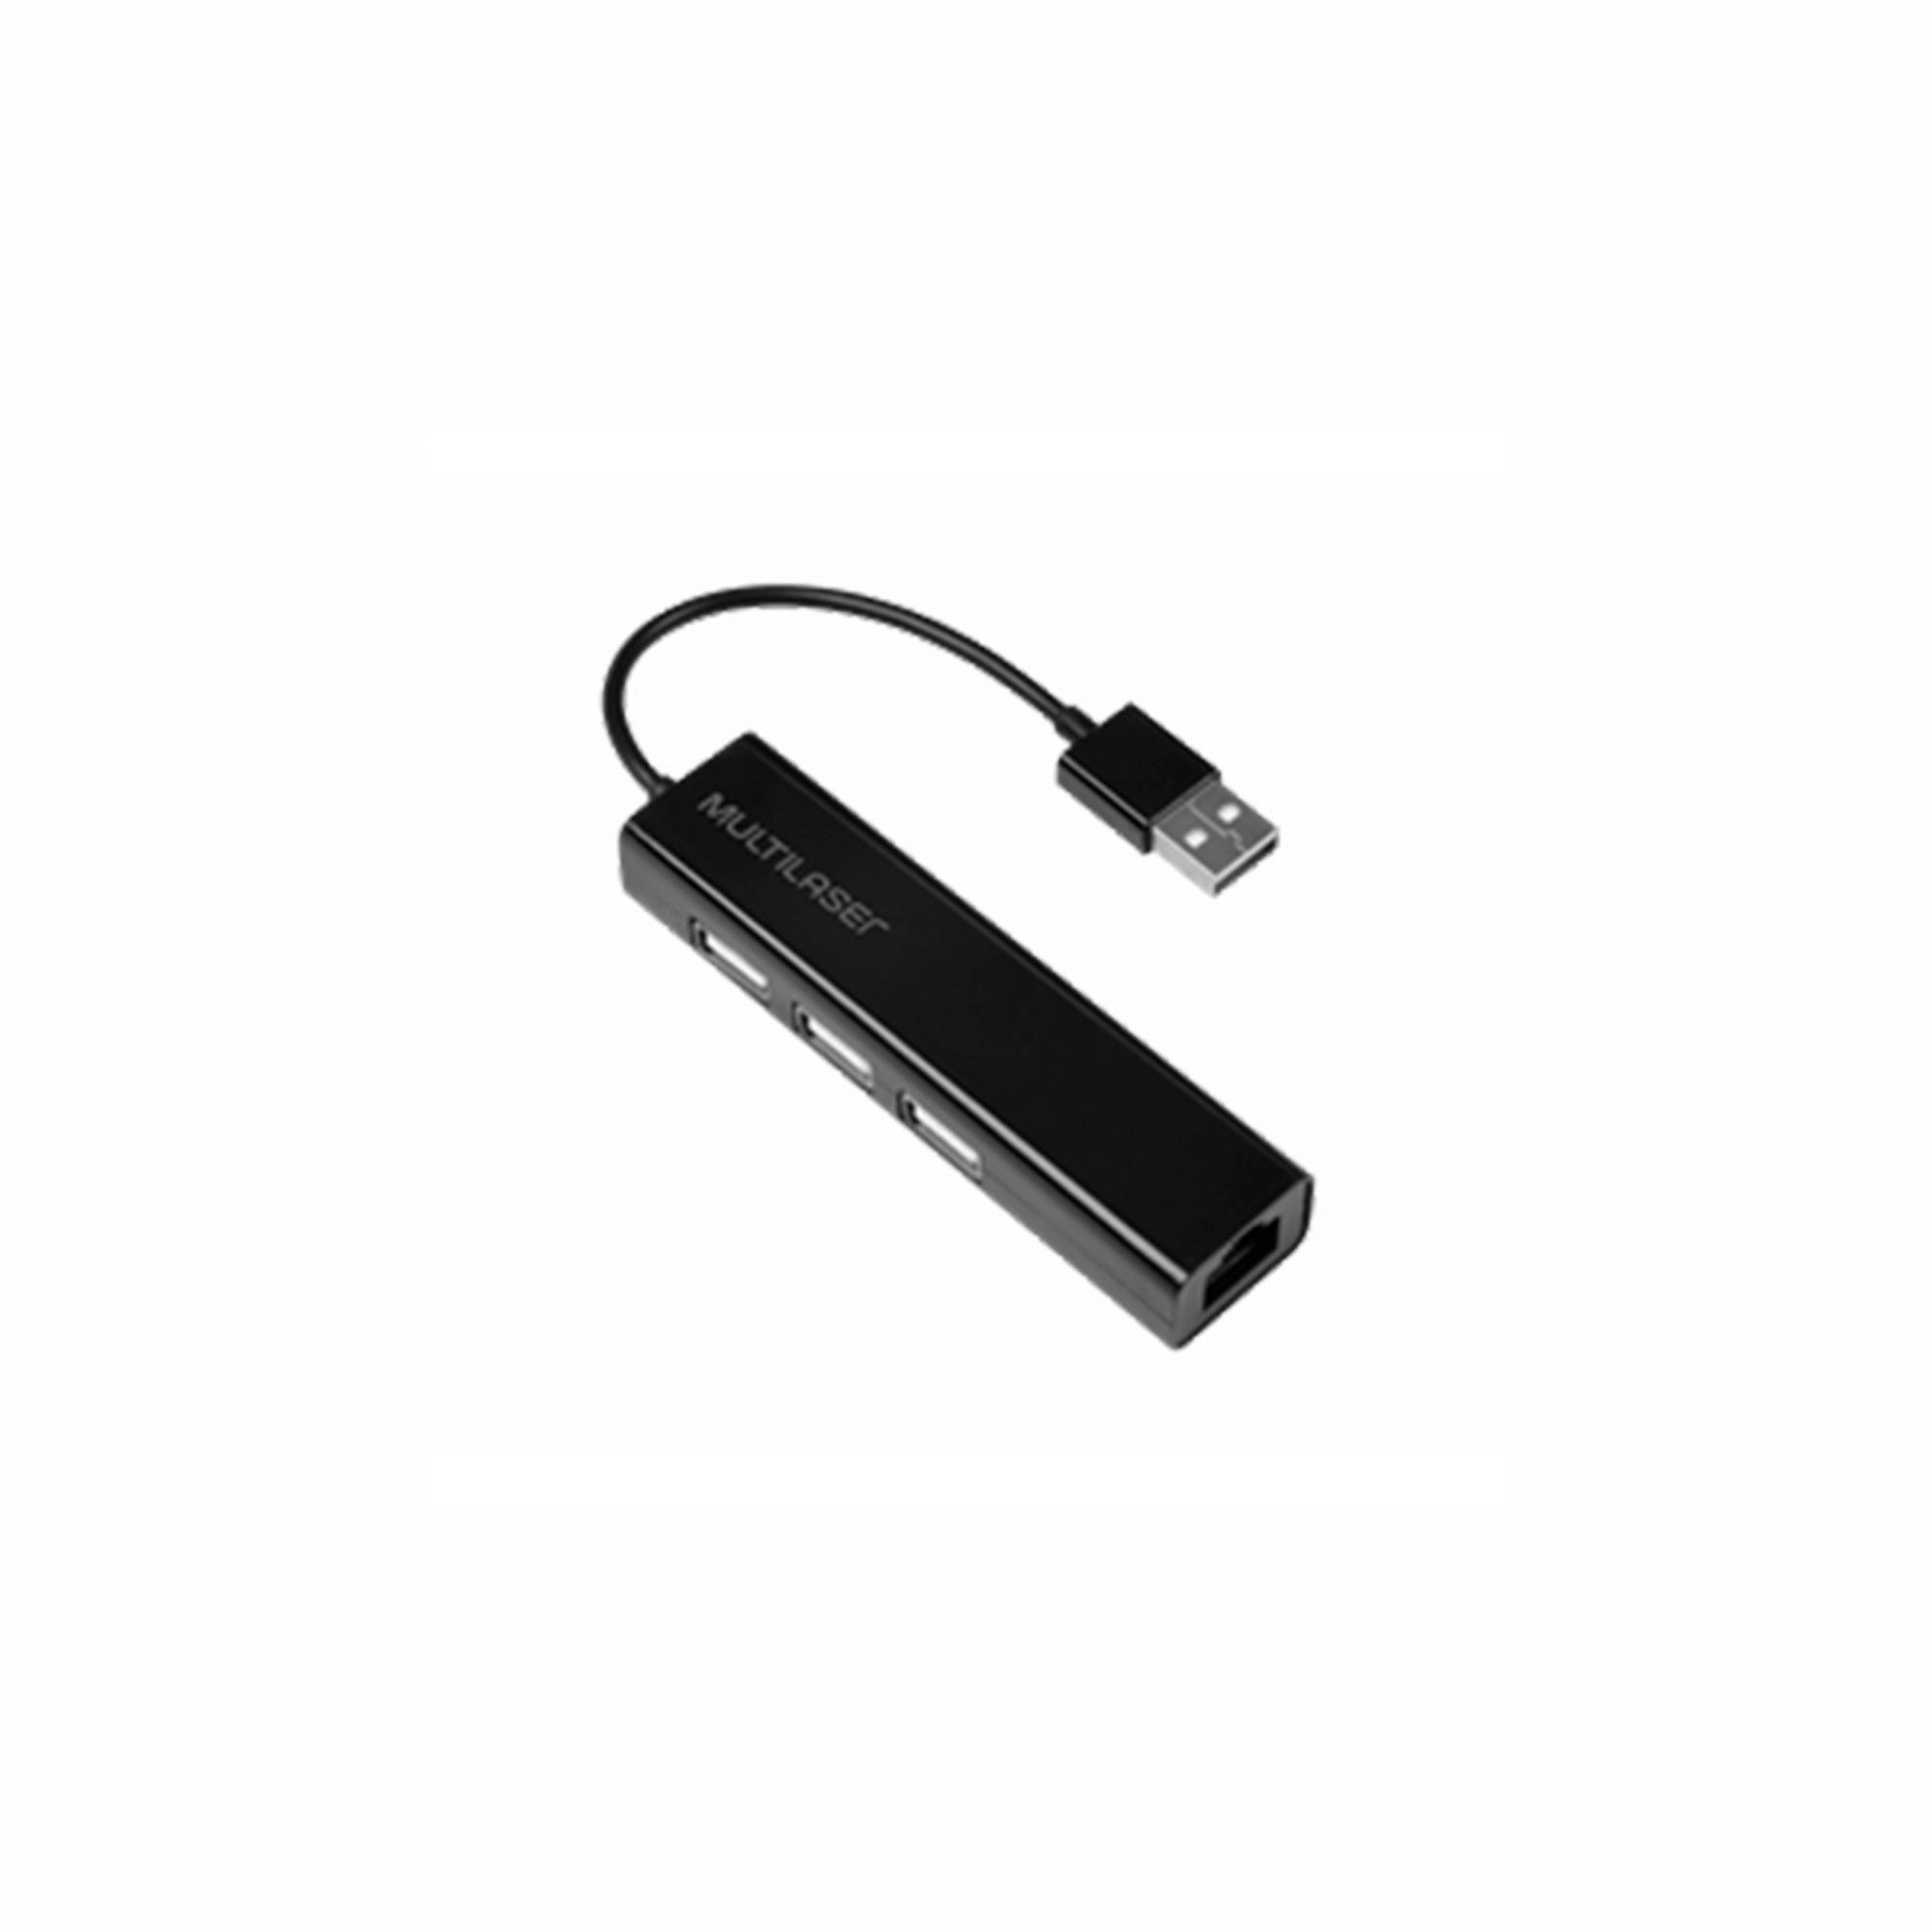 CONVERSOR HUB USB 2.0 3P +RJ45 FEMEA PRETO AC304 MULTILASER